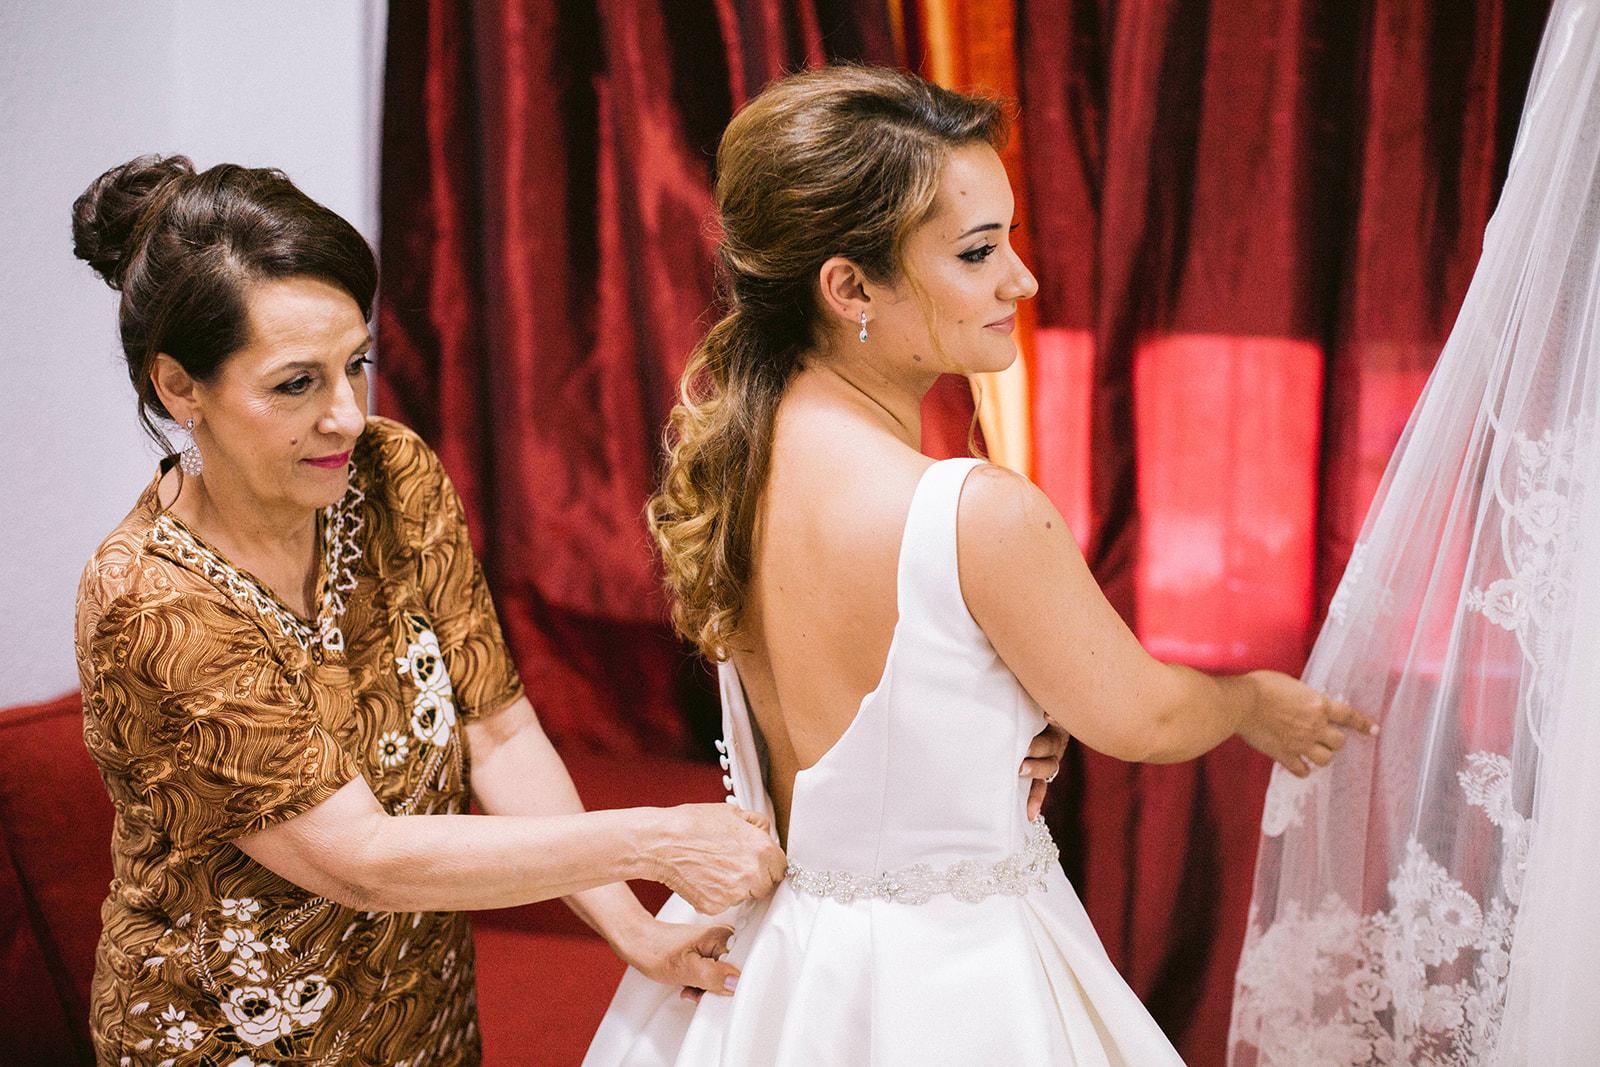 Madre vistiendo a su hija antes de la boda